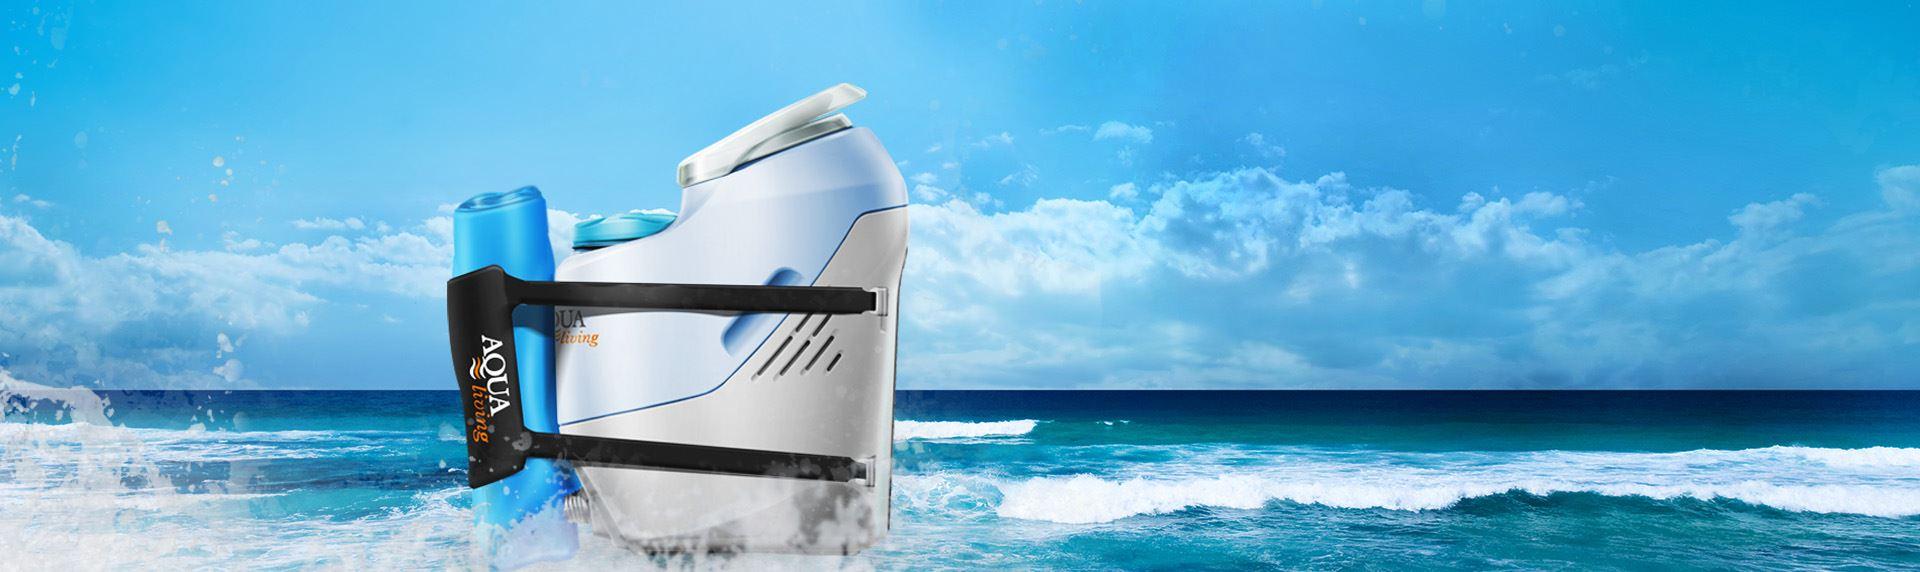 SSC设计-智能浴缸造浪机